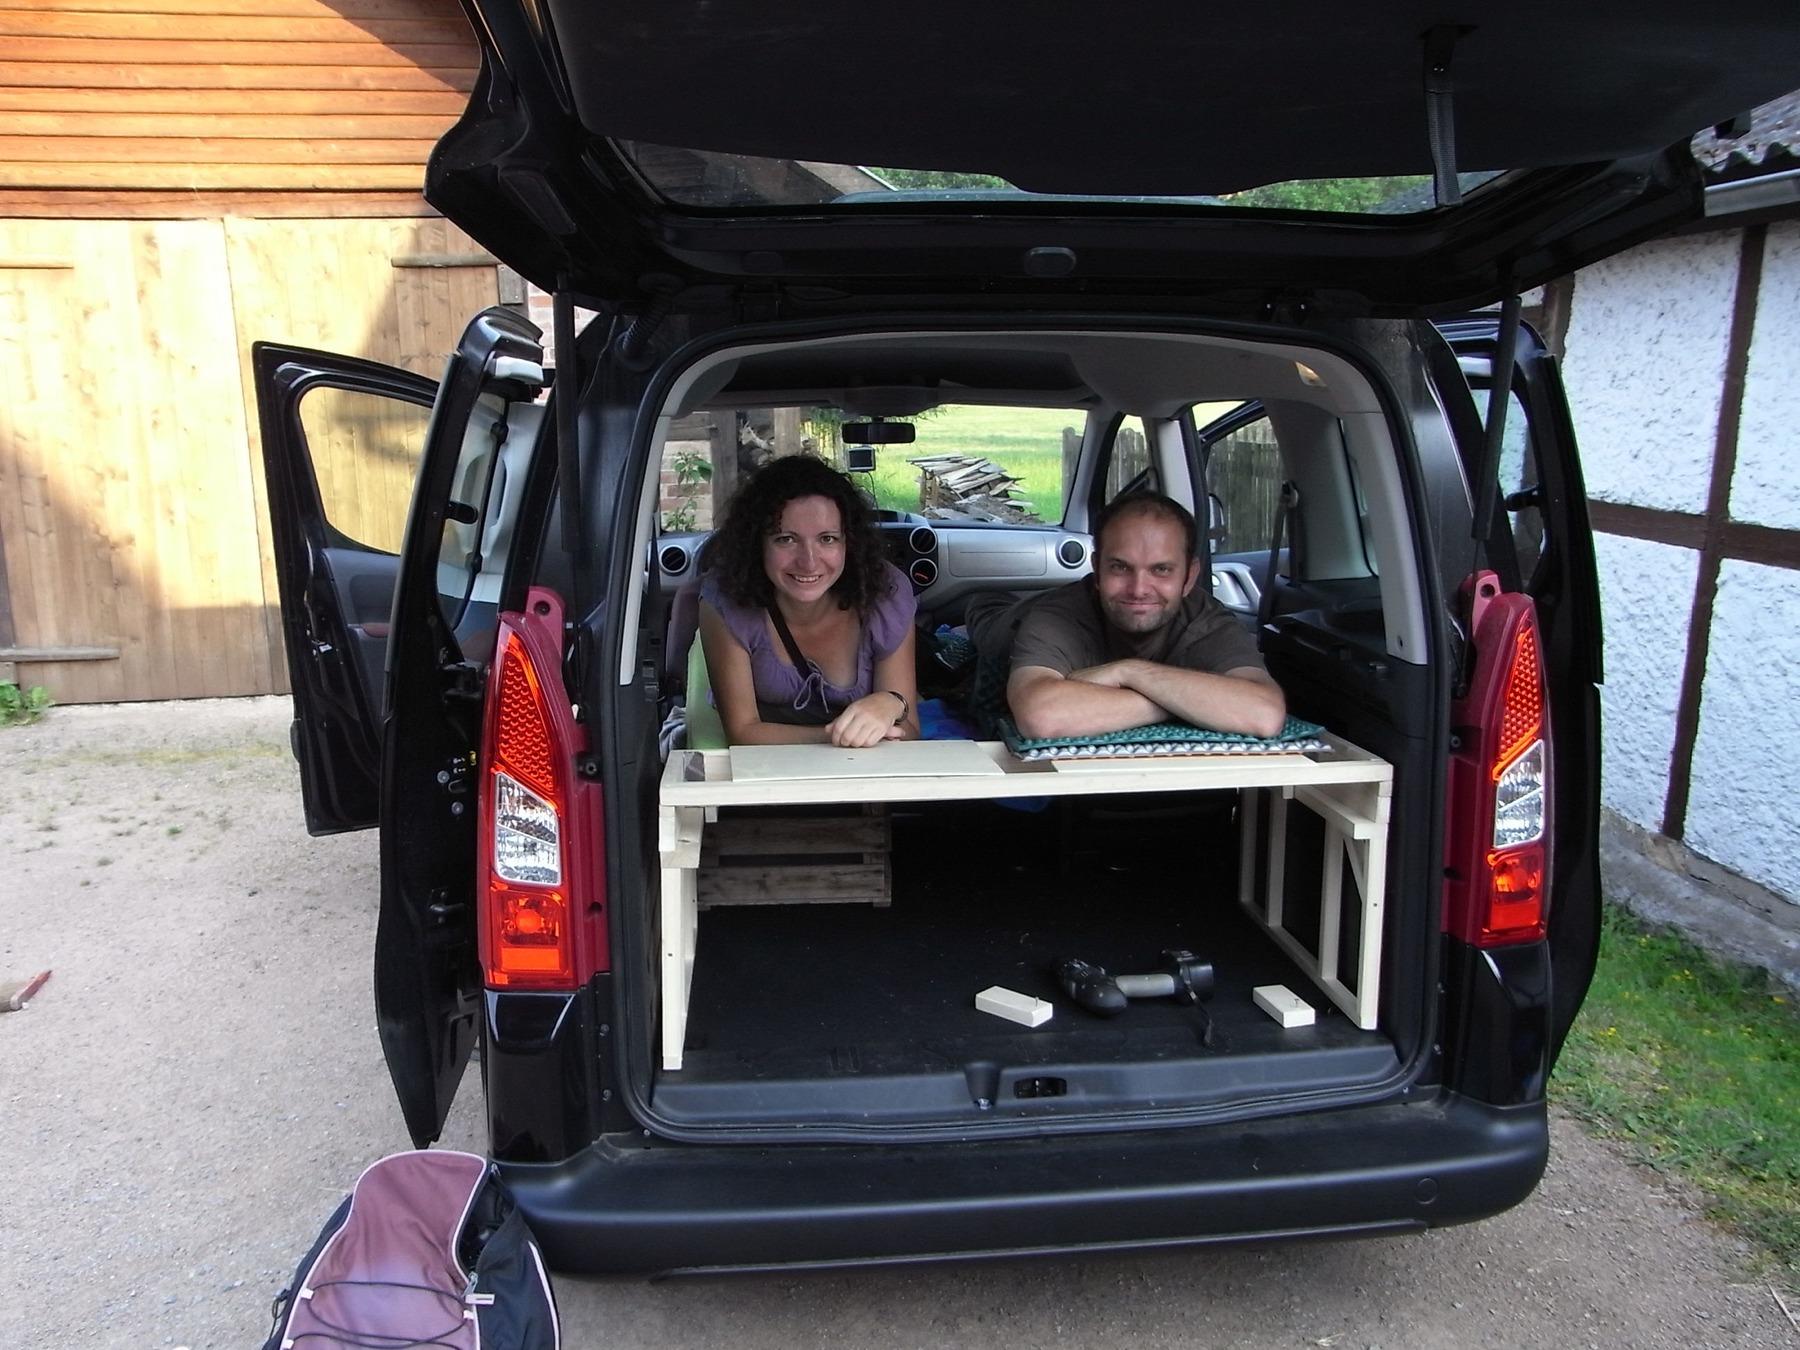 100 rabatt auf die bernachtung. Black Bedroom Furniture Sets. Home Design Ideas